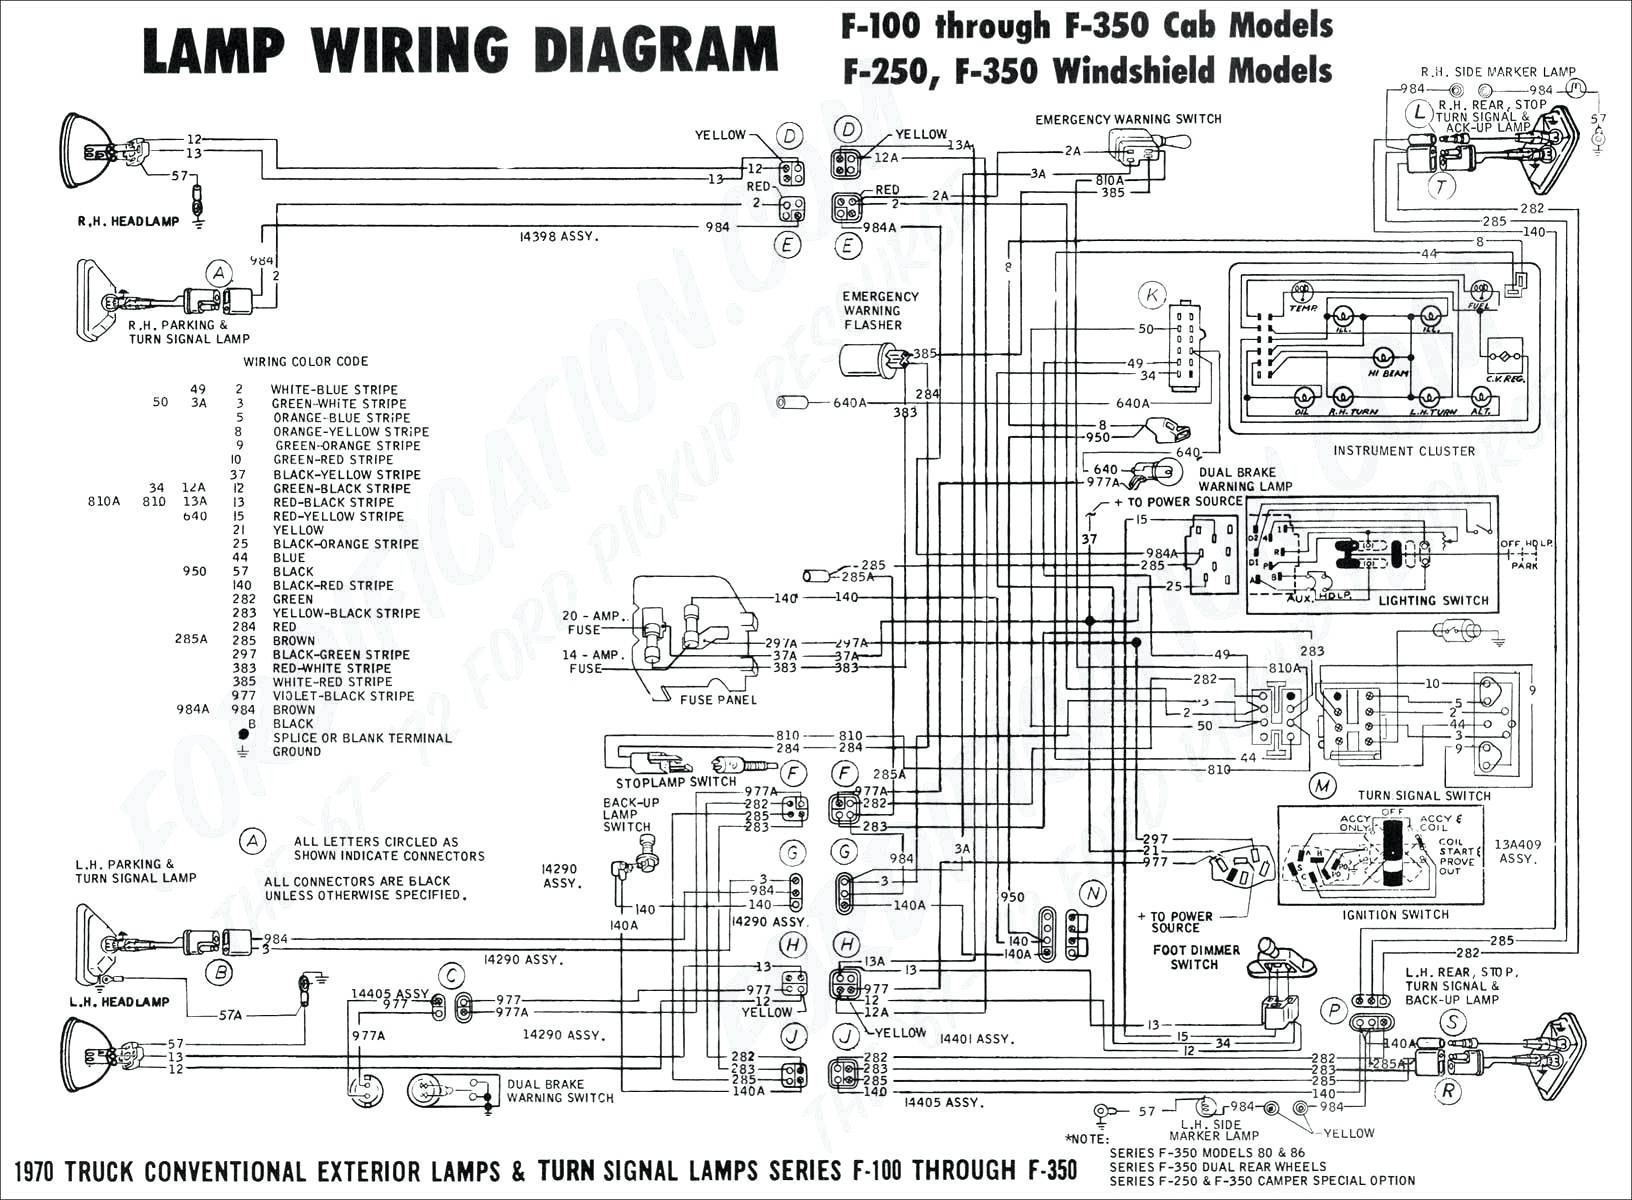 Generator Changeover Switch Wiring Diagram Wiring Diagram Generator Changeover Switch Valid Generator Of Generator Changeover Switch Wiring Diagram